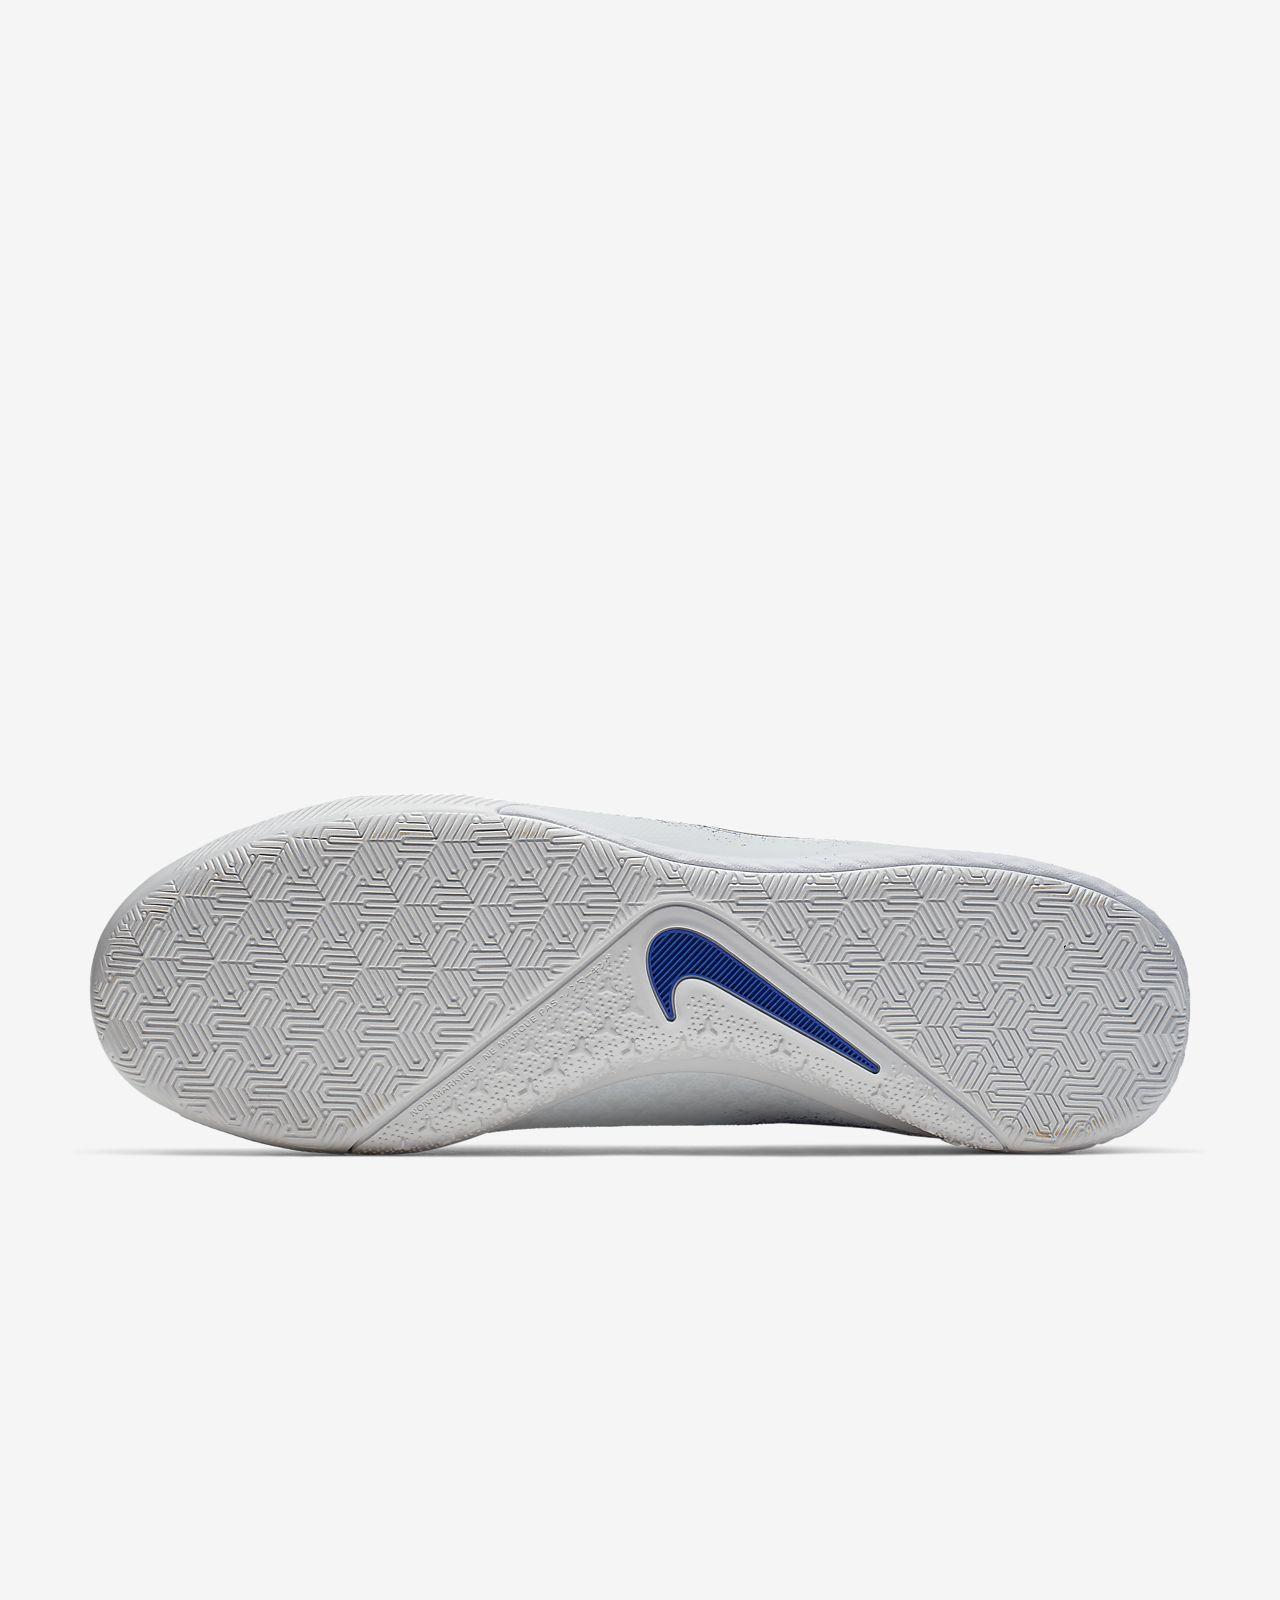 8332e975 ... Nike React Phantom Vision Pro Dynamic Fit IC Botas de fútbol sala